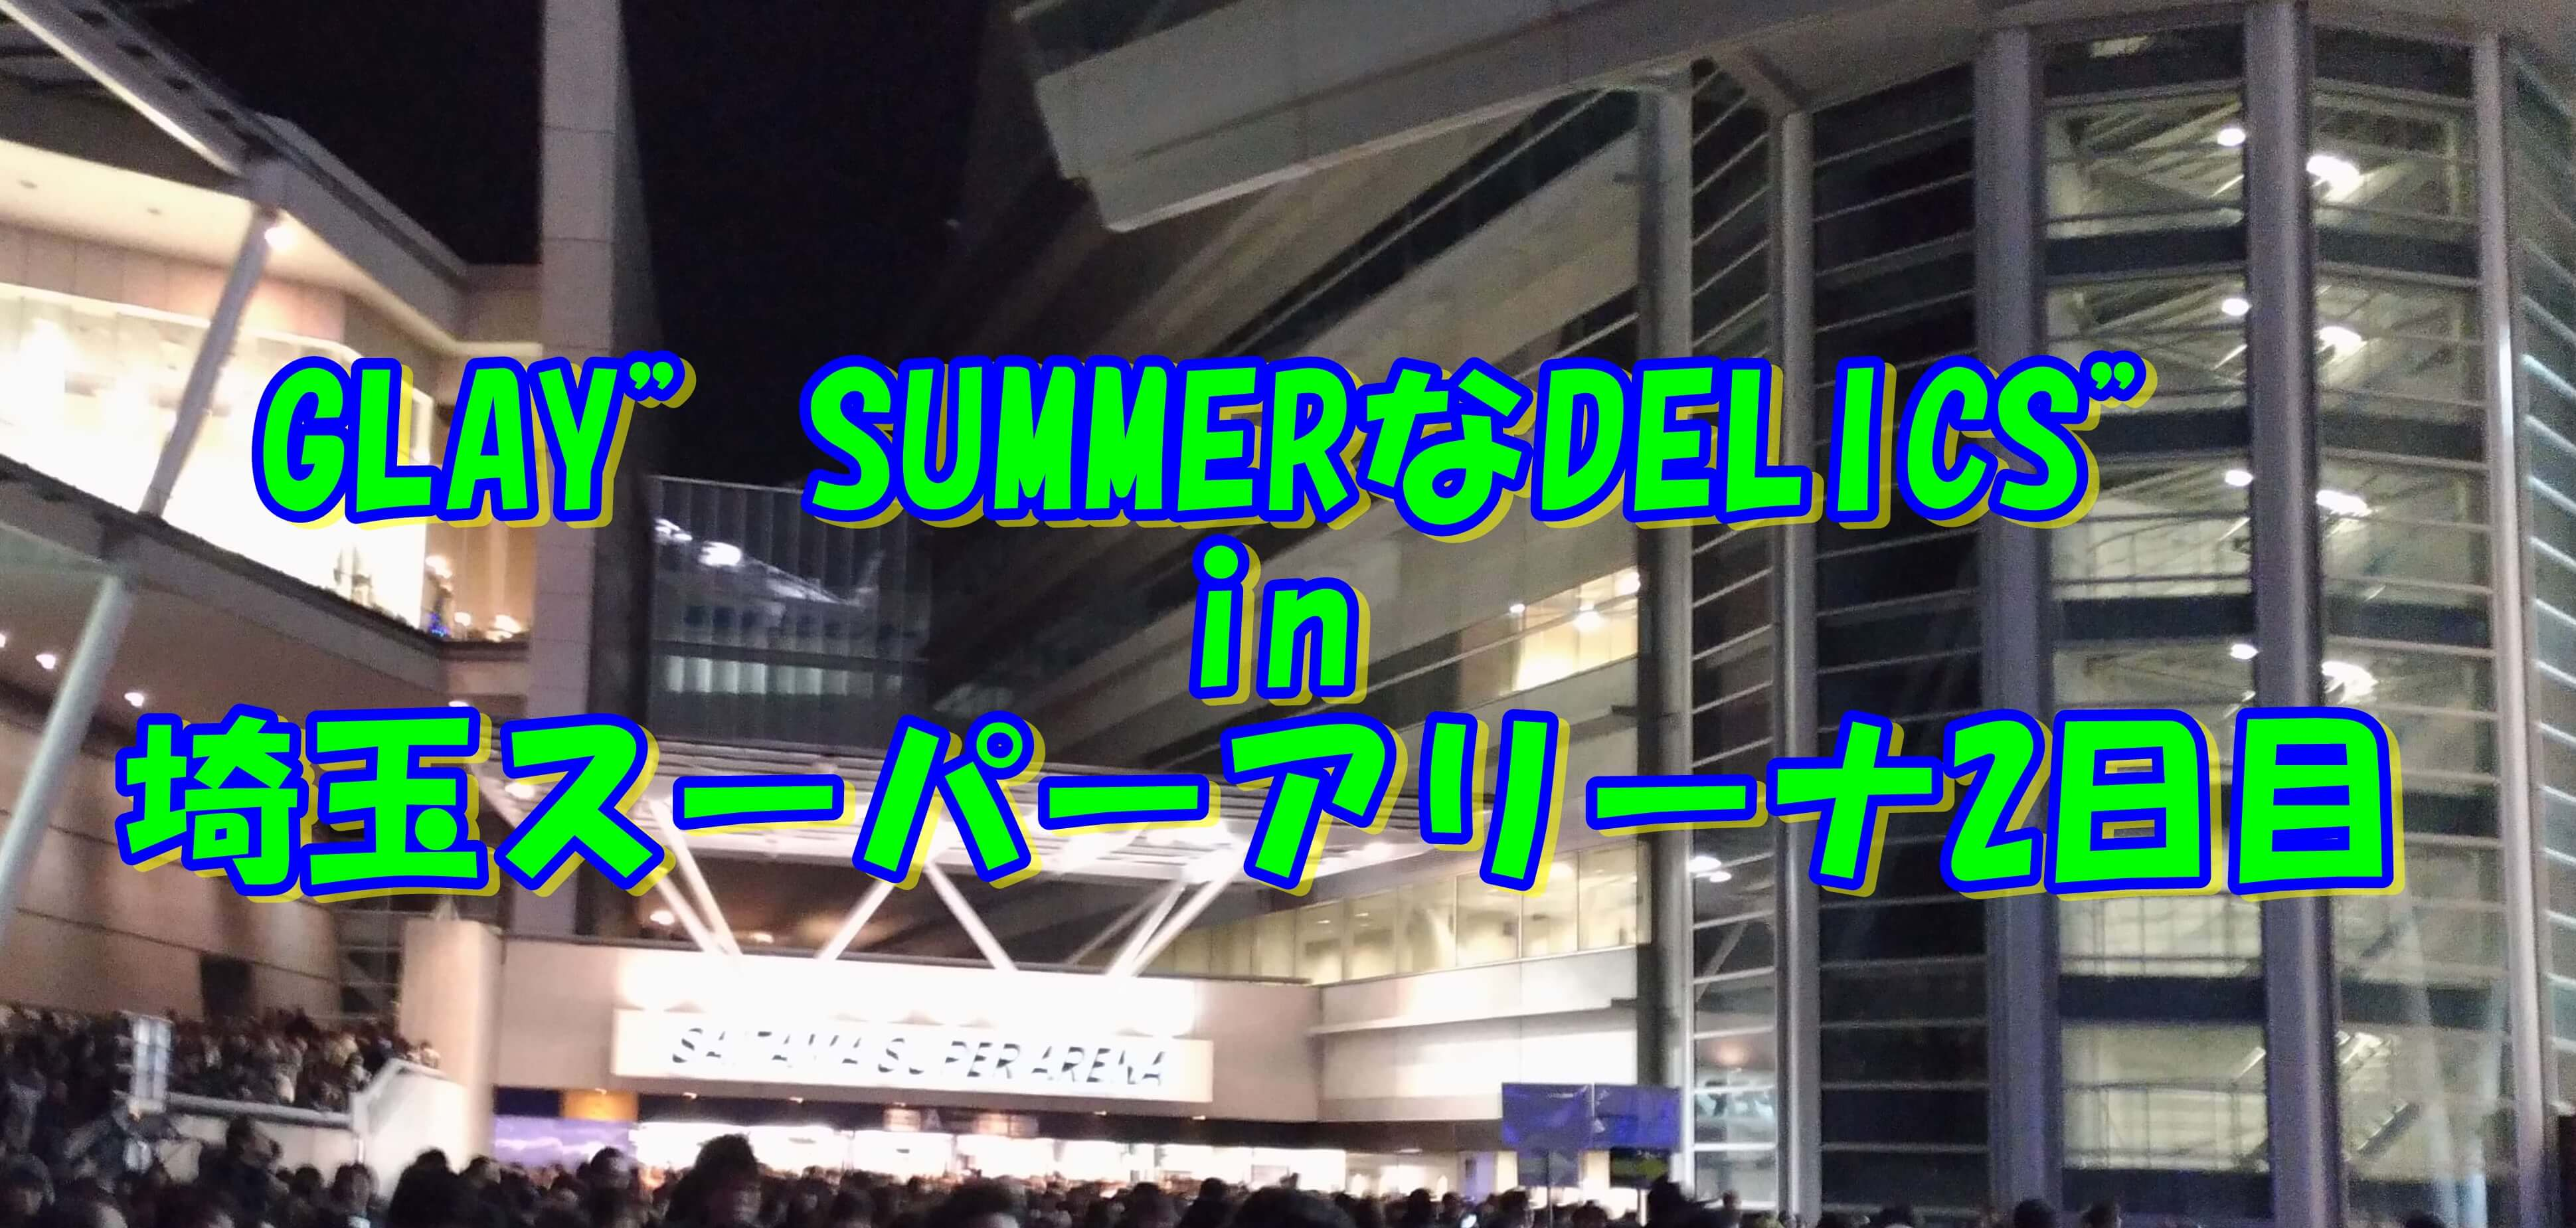 "GLAY""SUMMERなDELICS""in埼玉スーパーアリーナ2日目"